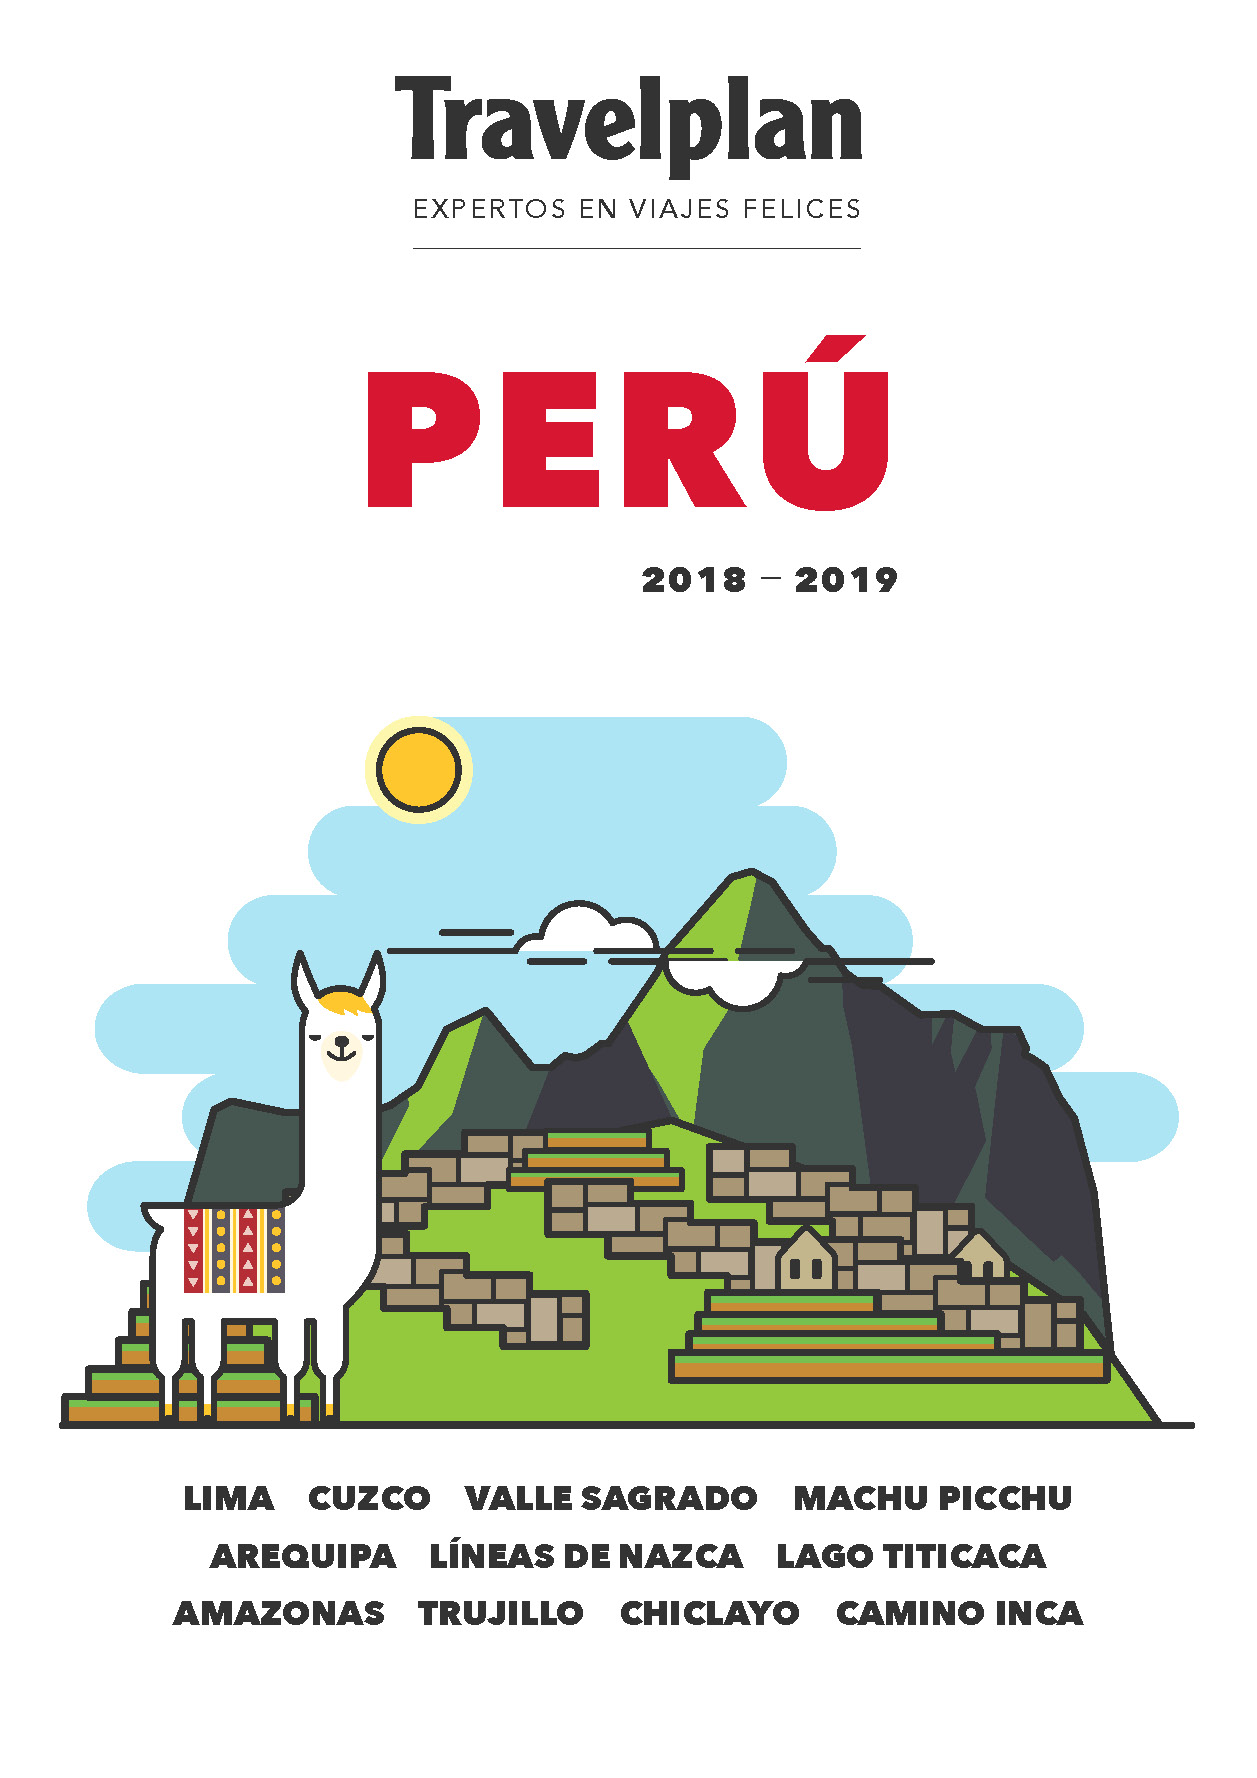 Catalogo Travelplan Peru 2018-2019